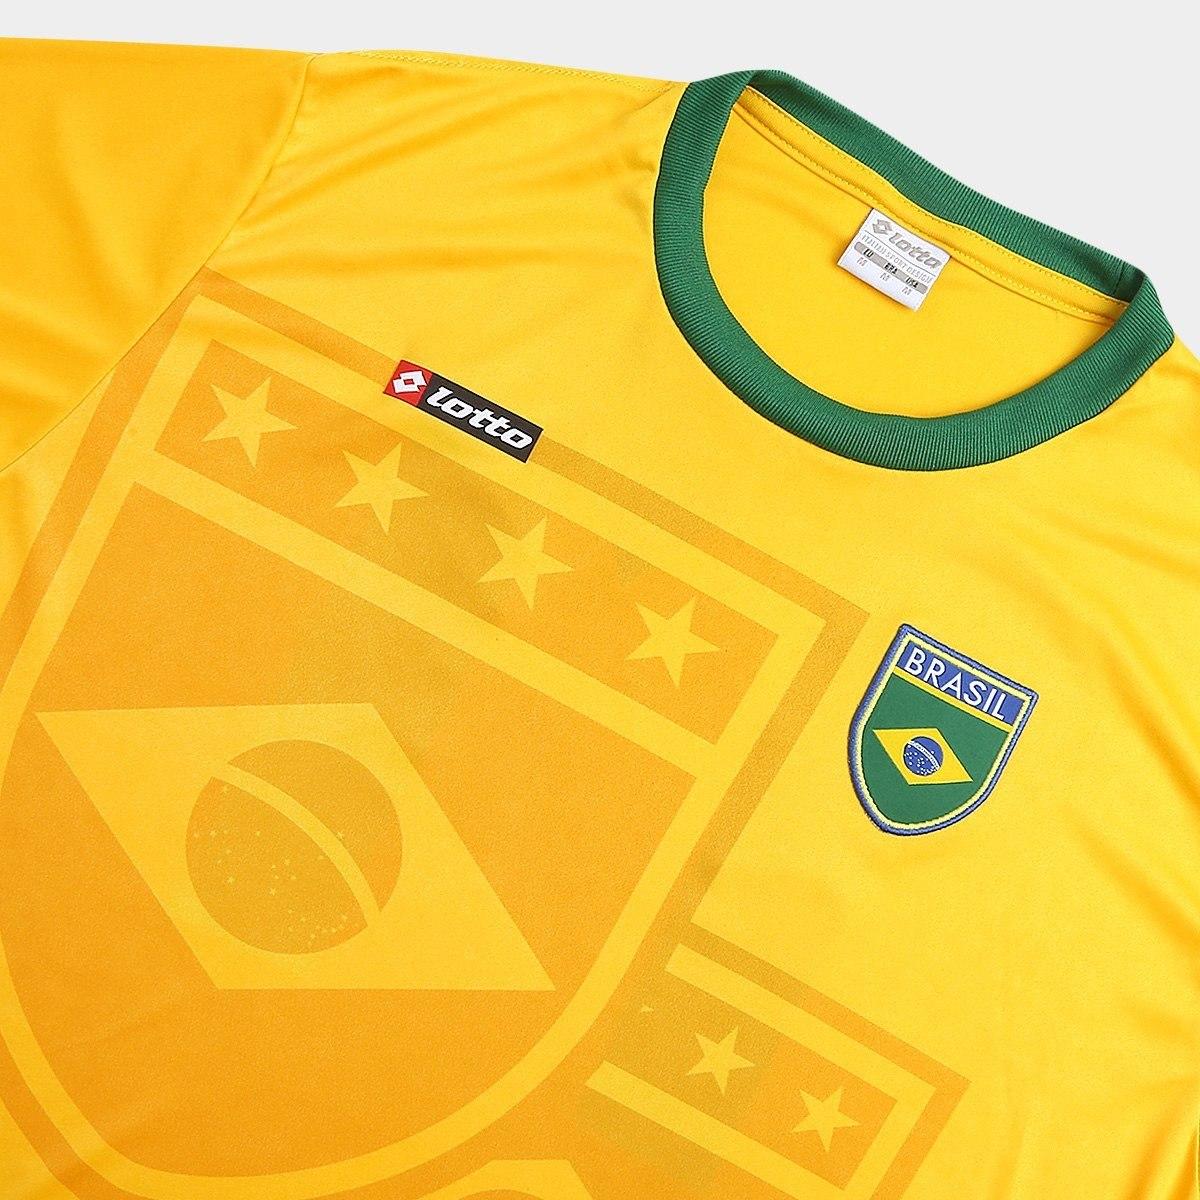 dfda73b3592dc camisa brasil 1994 n° 11 lotto - lançamento. Carregando zoom.